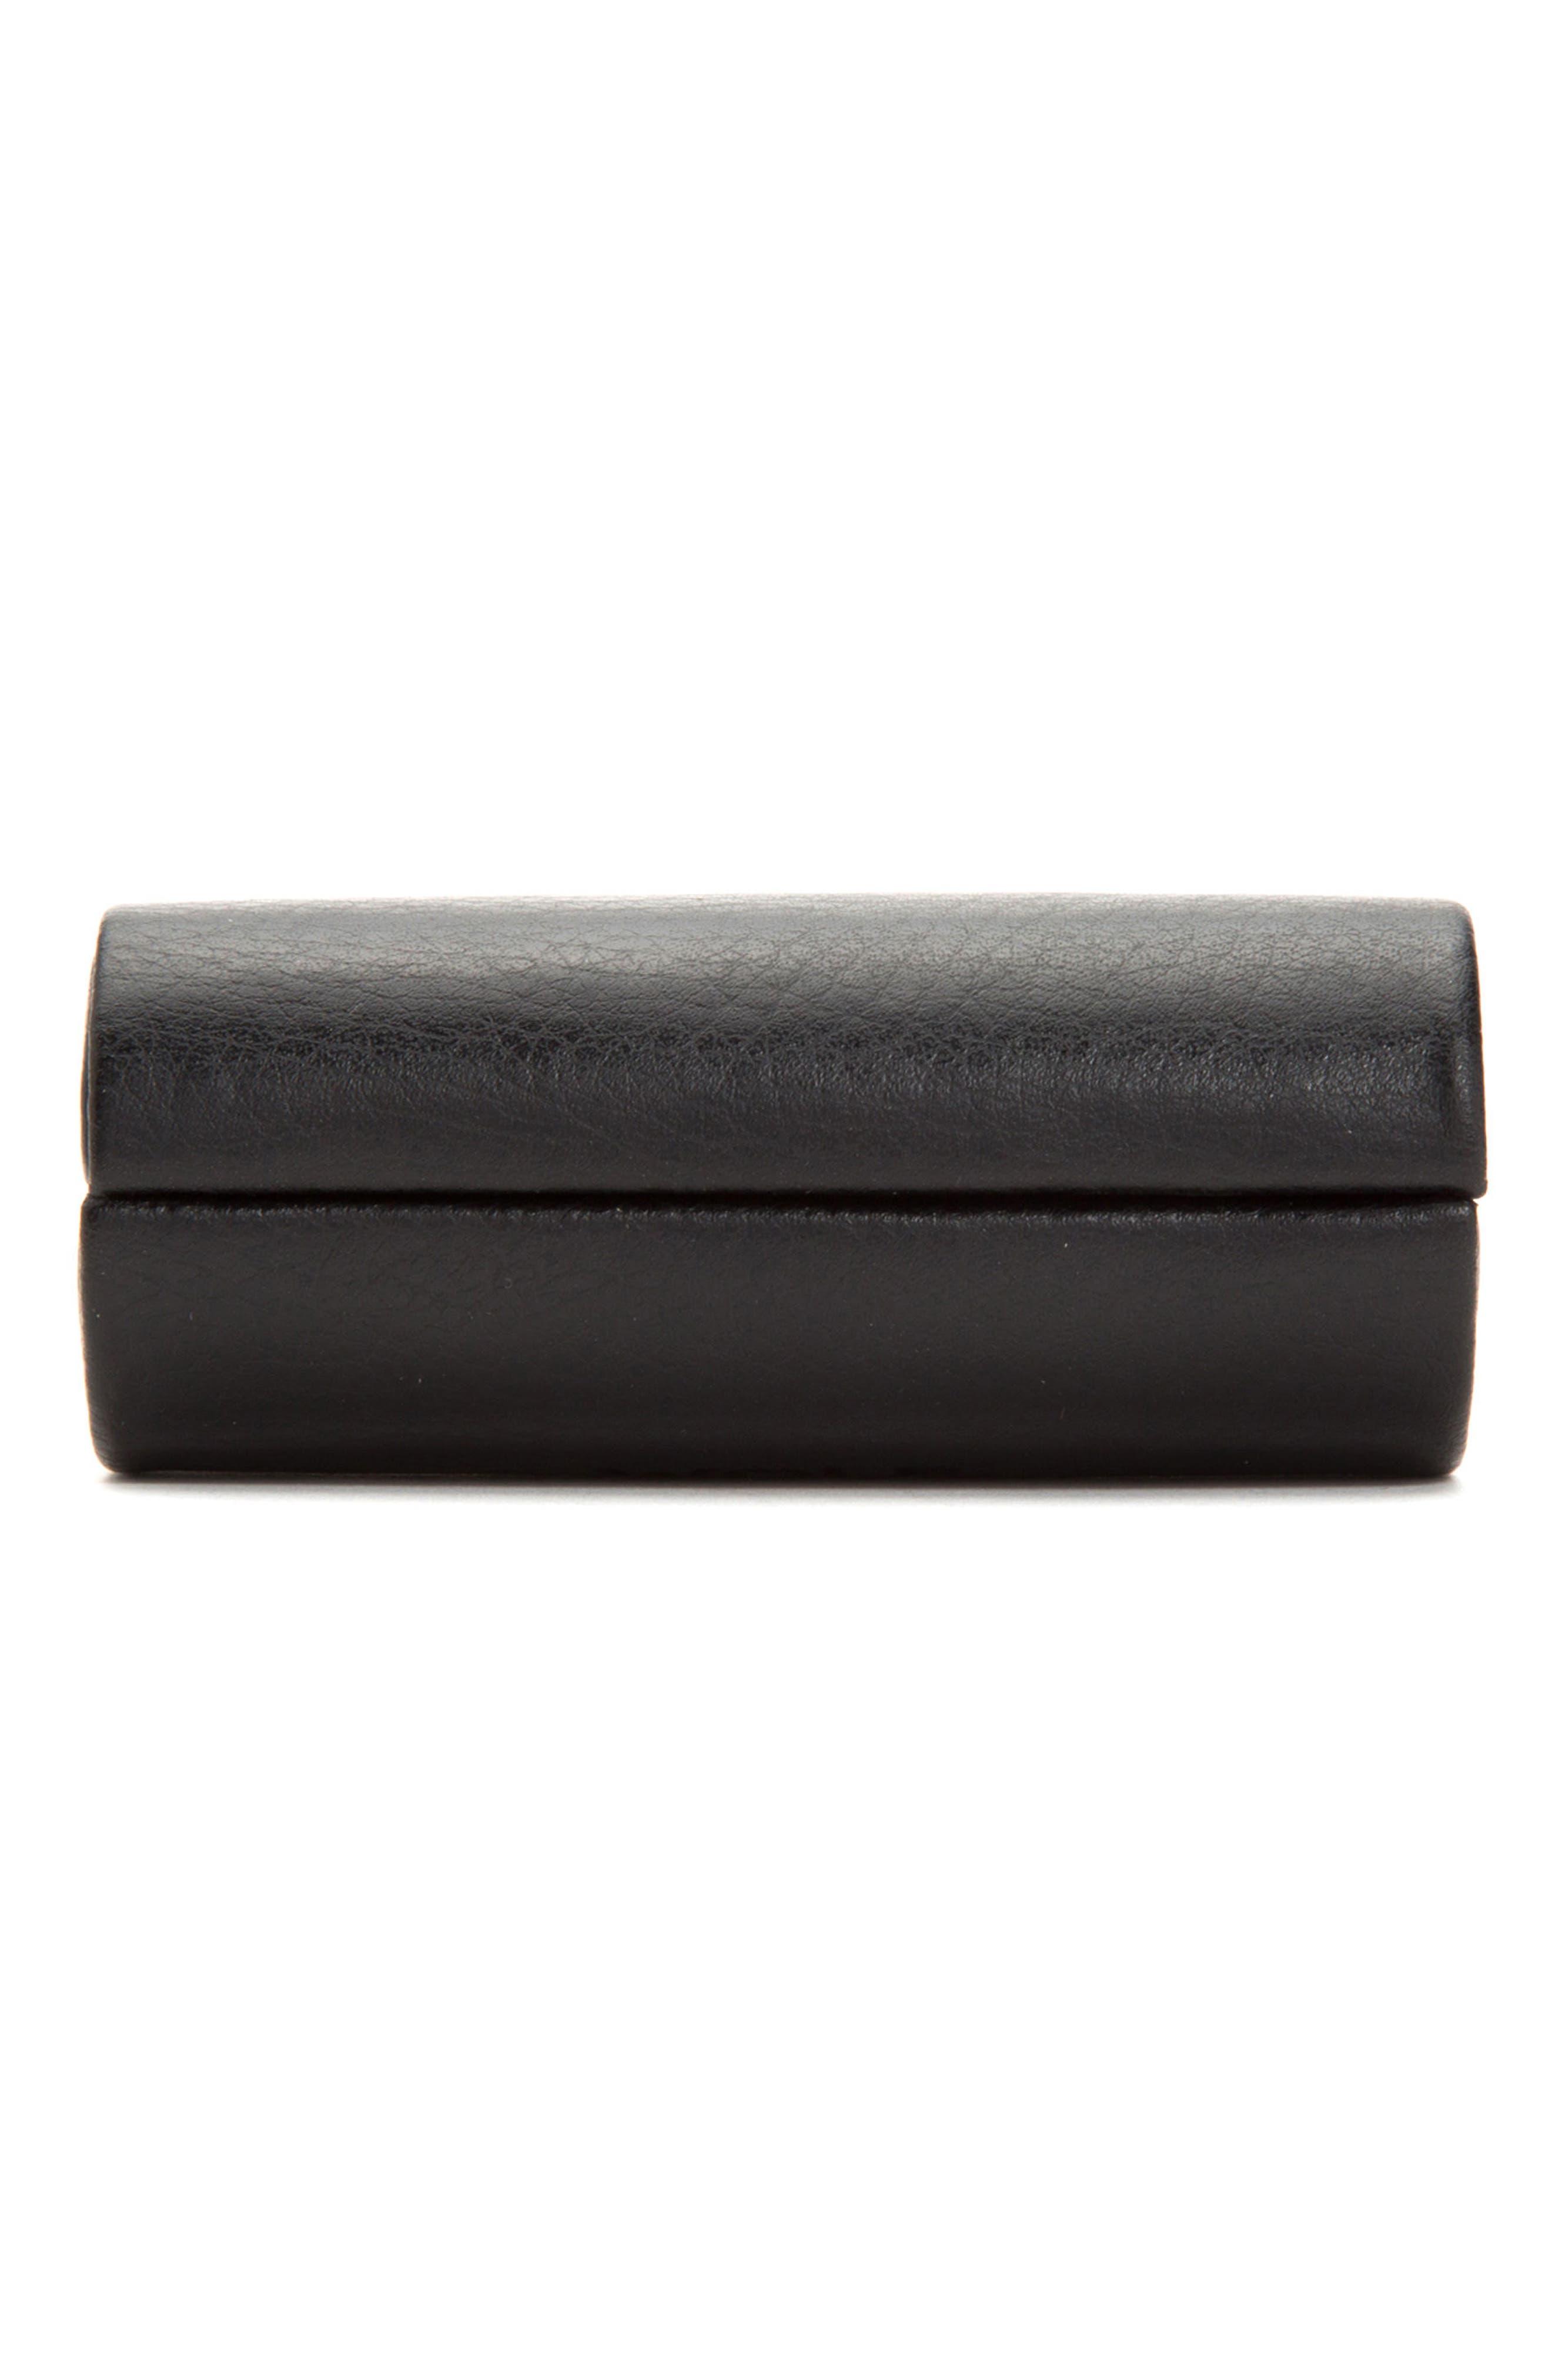 Howard Cuff Link Box,                         Main,                         color, BLACK